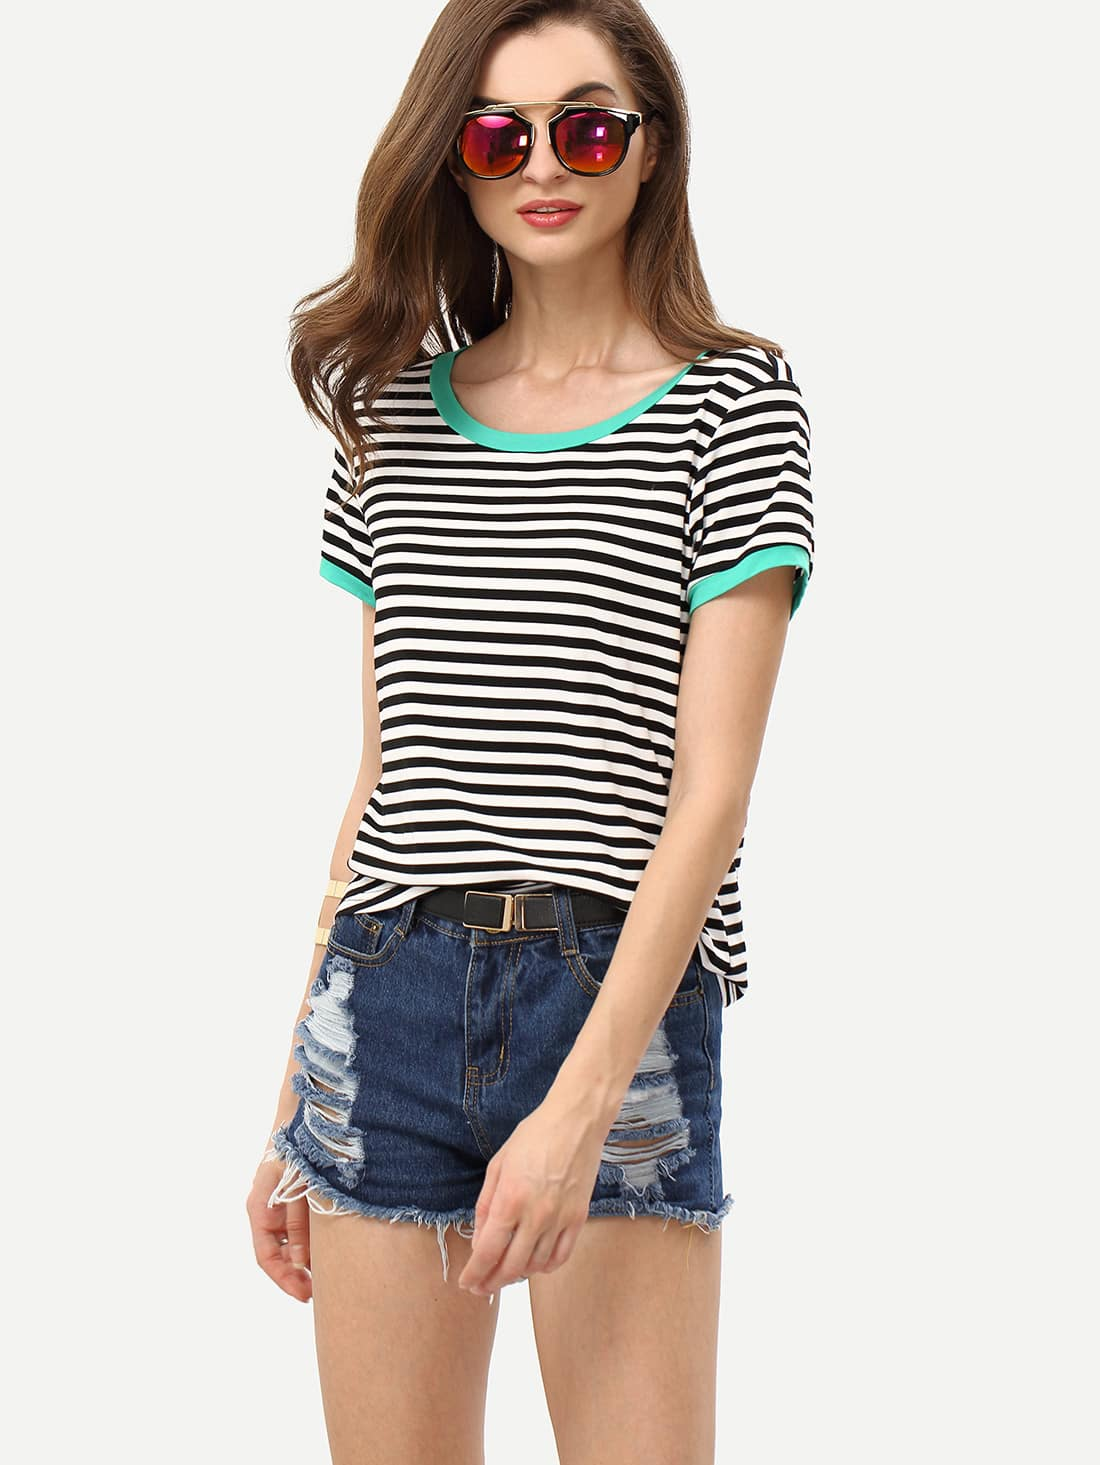 Black White Striped Short Sleeve T-shirt -SheIn(Sheinside)